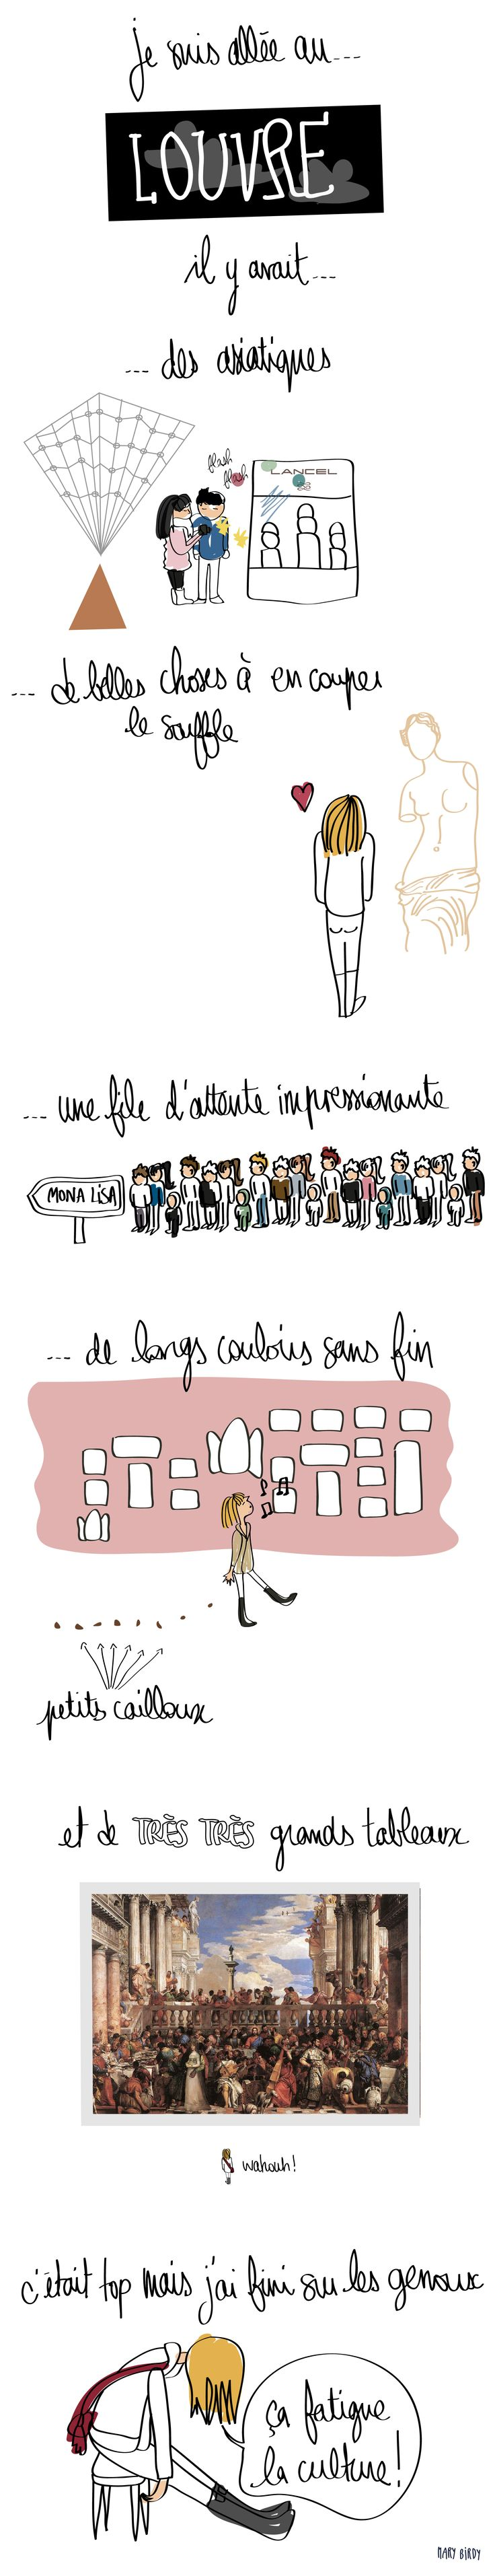 Illustration: Mary Birdy http://www.marybirdy.fr/?p=5034